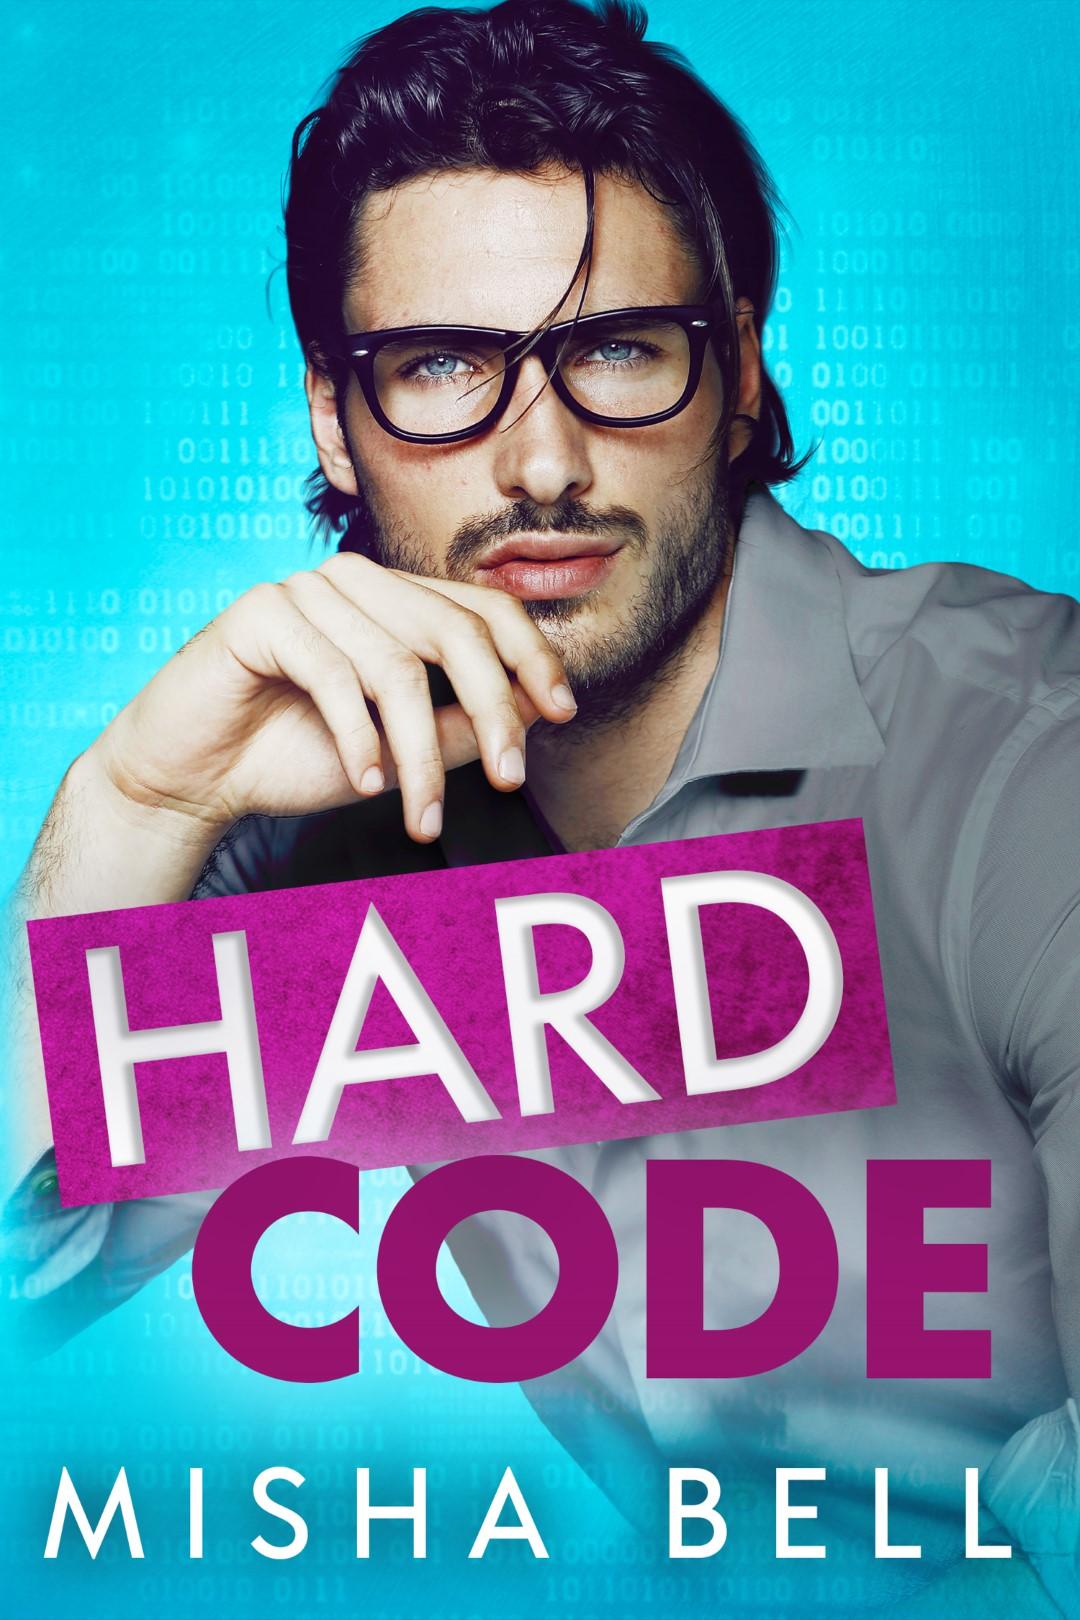 Hardcoden